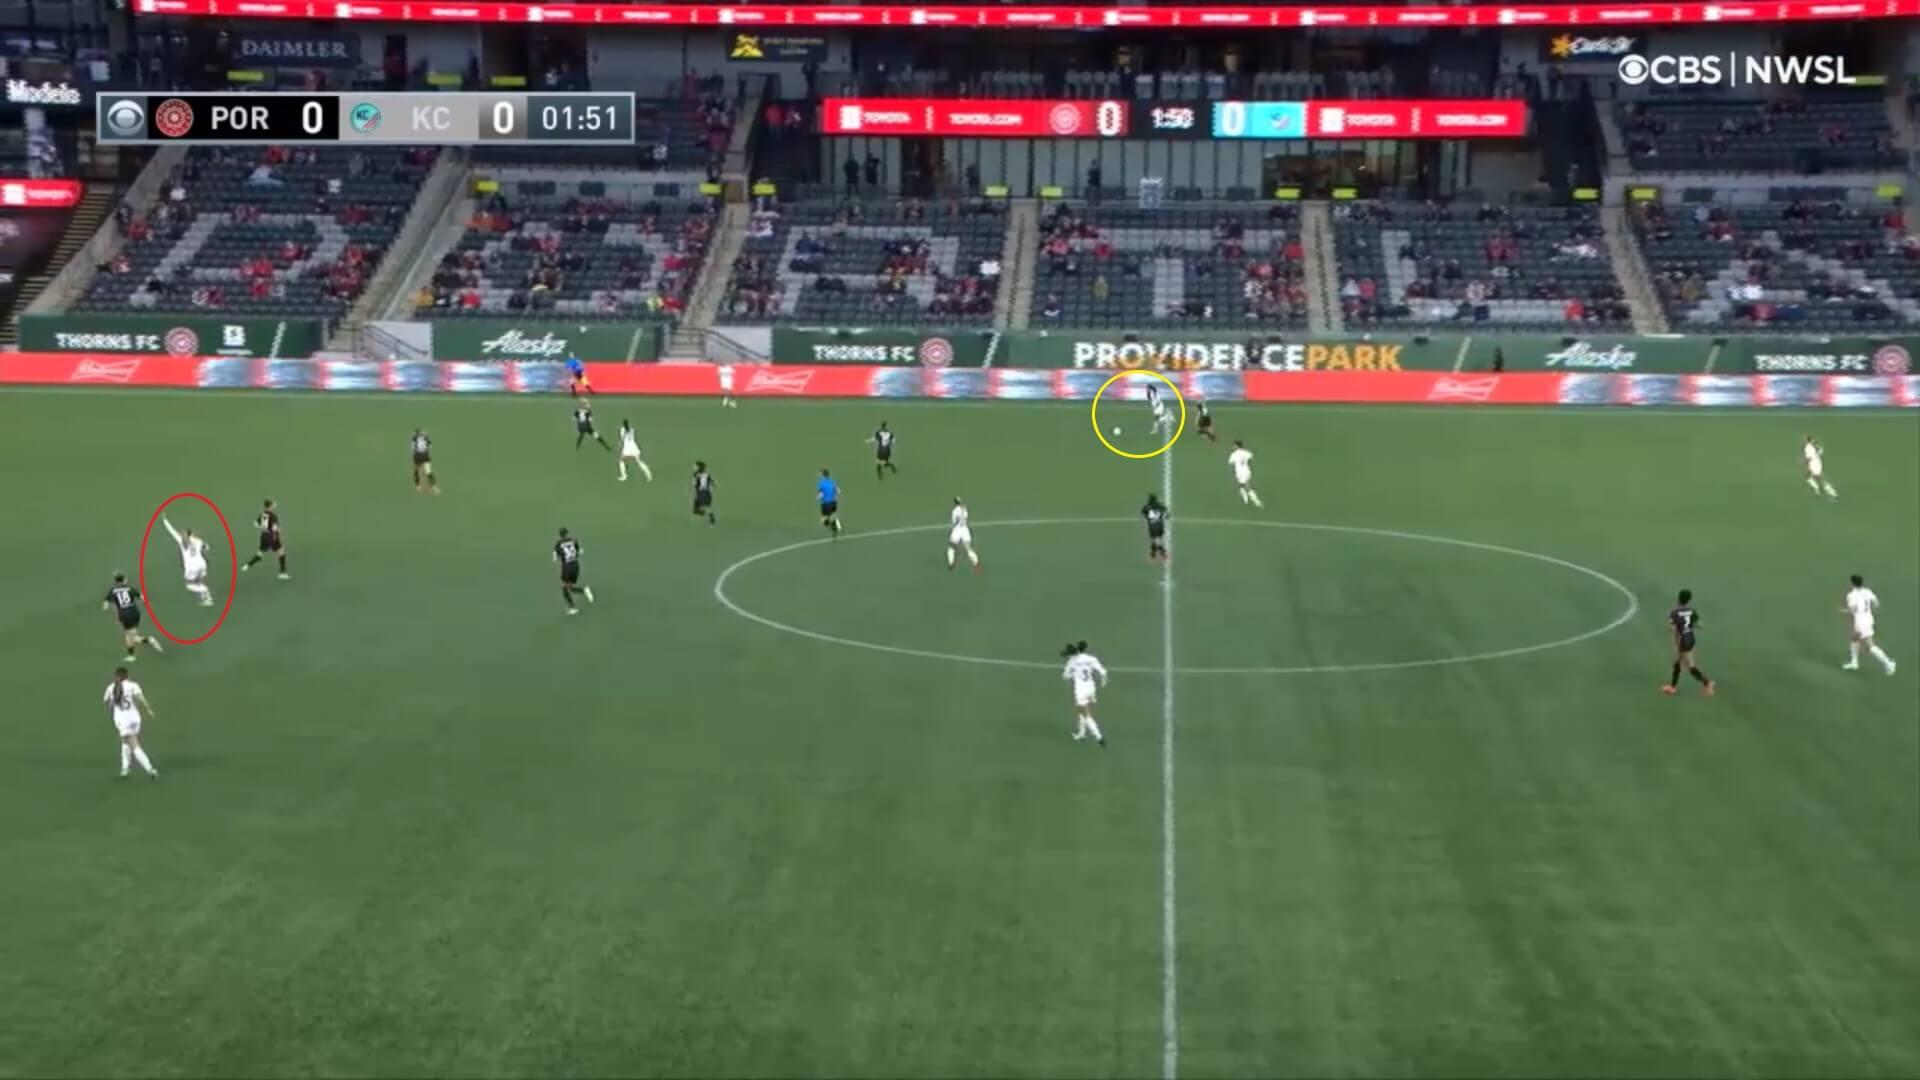 NWSL Challenge Cup 2021: Portland Thorns v Kansas City - tactical analysis tactics